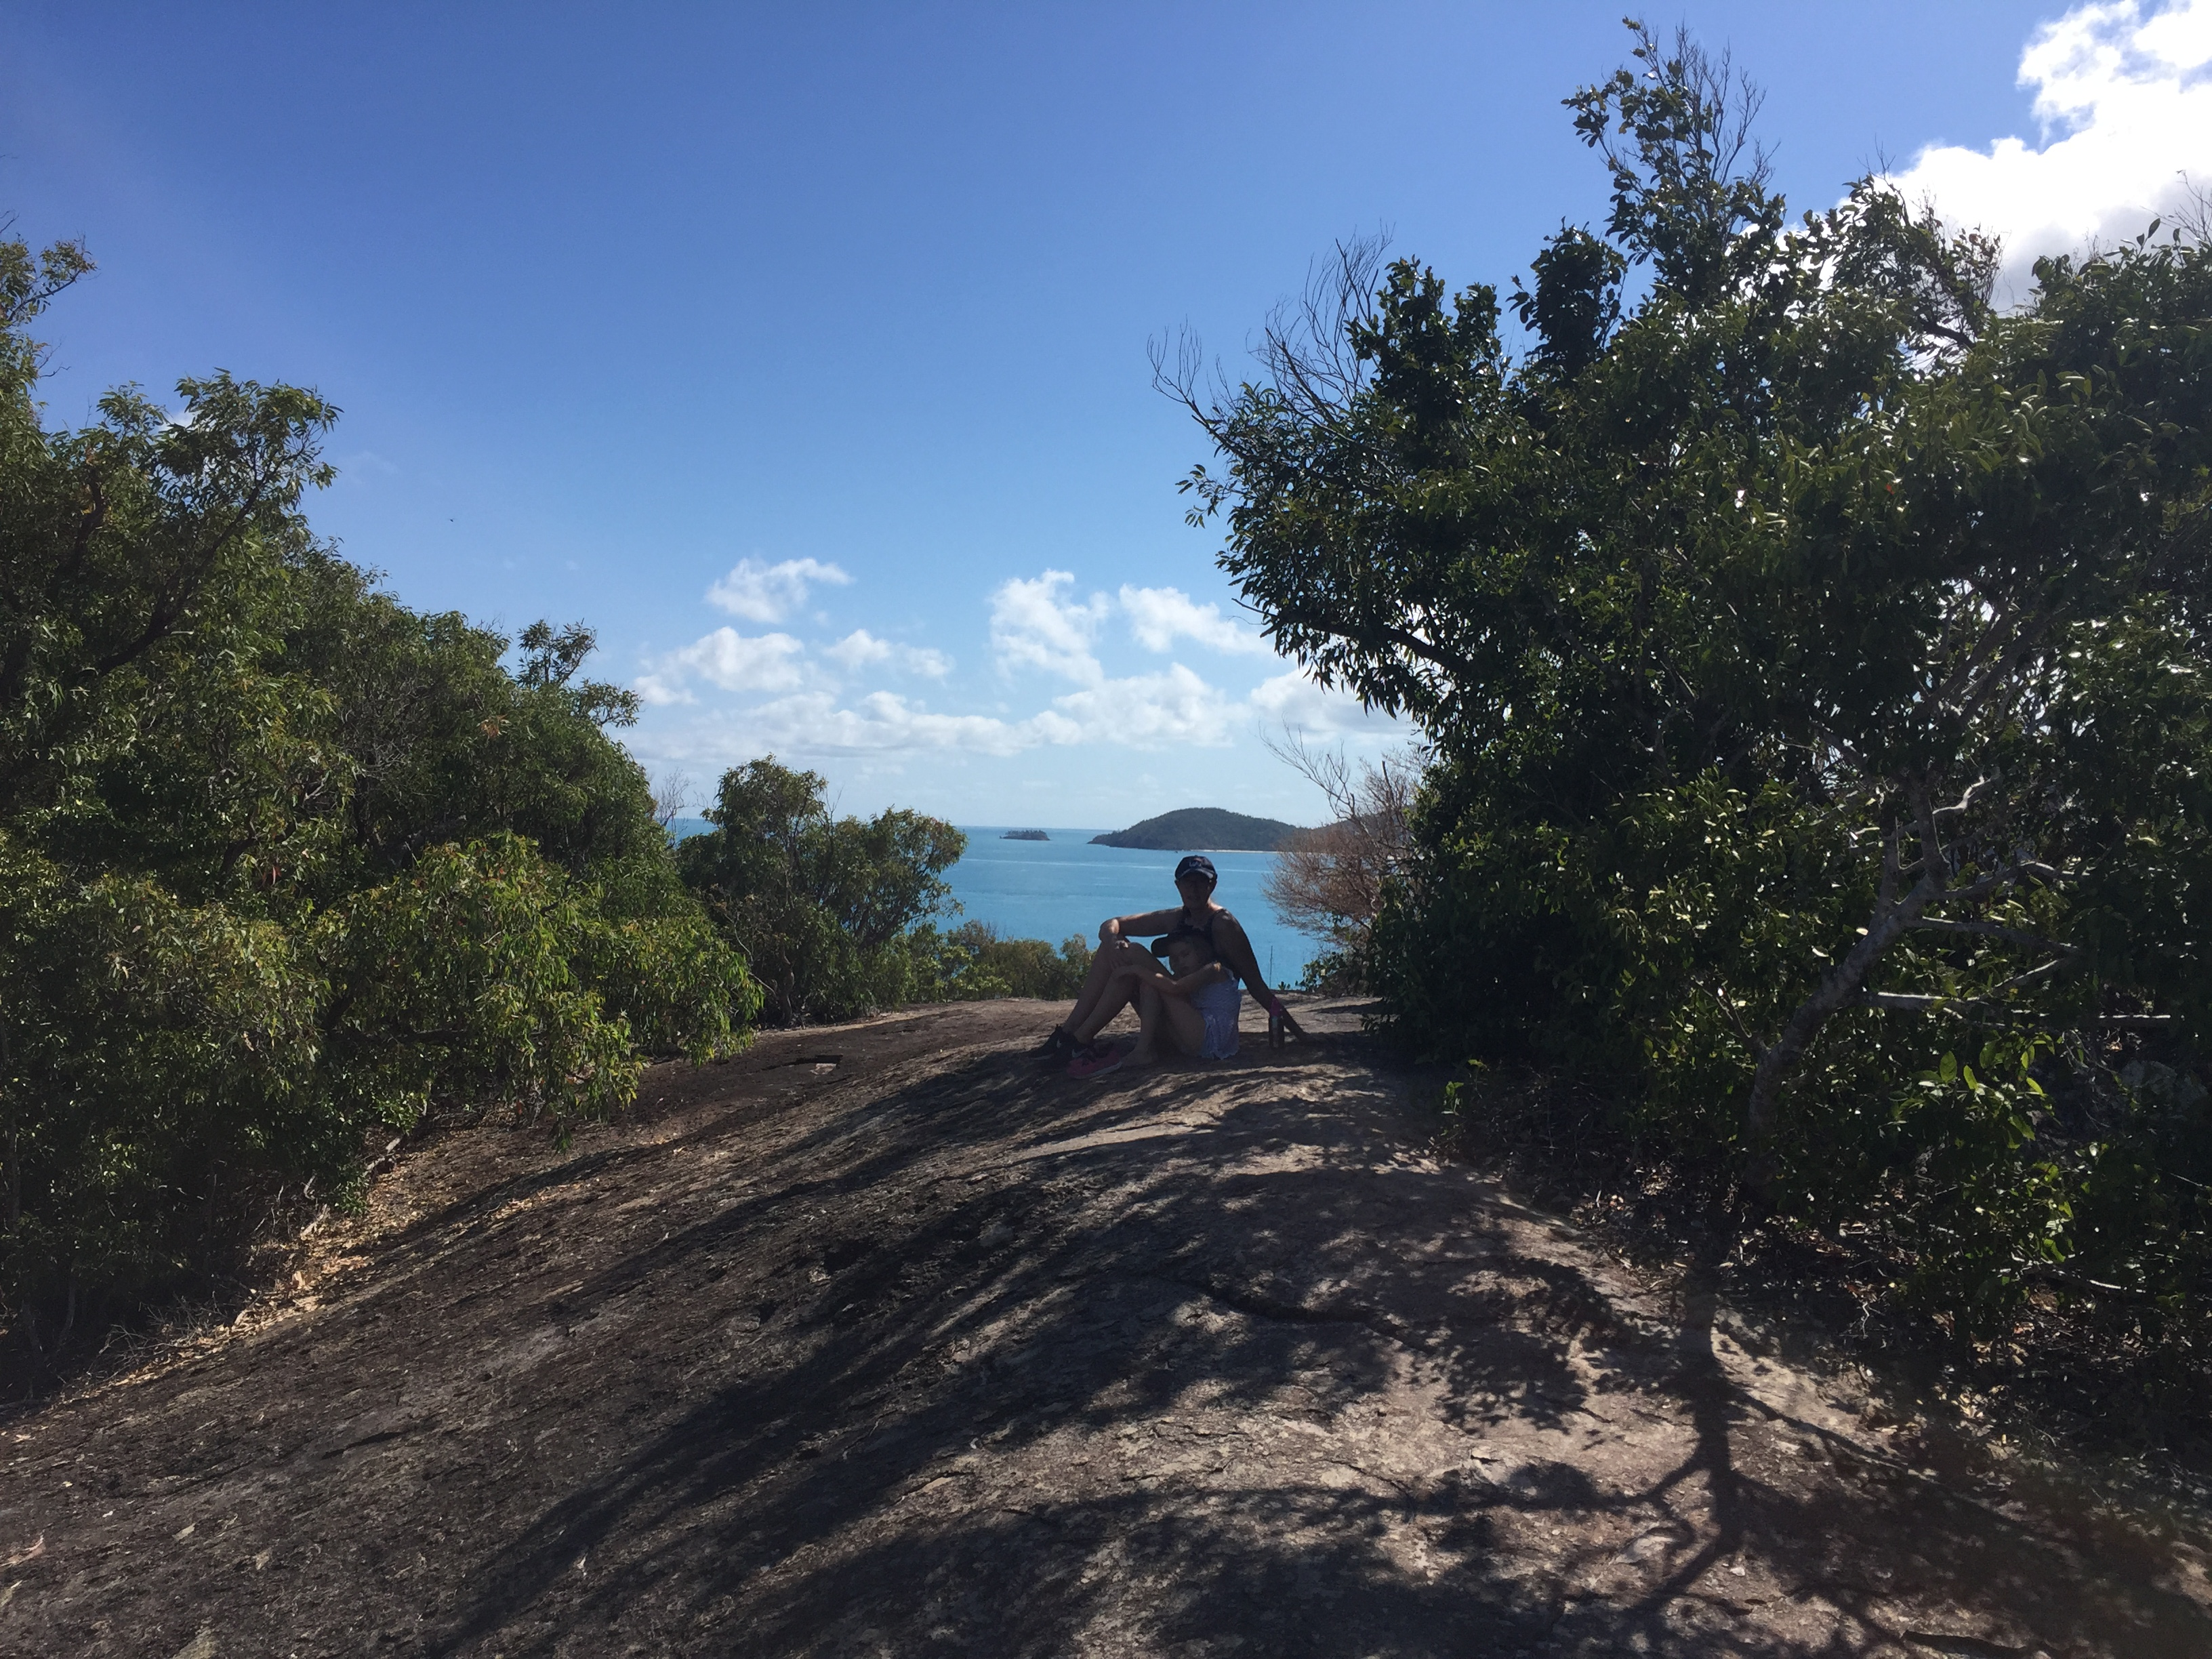 Crossing the Island